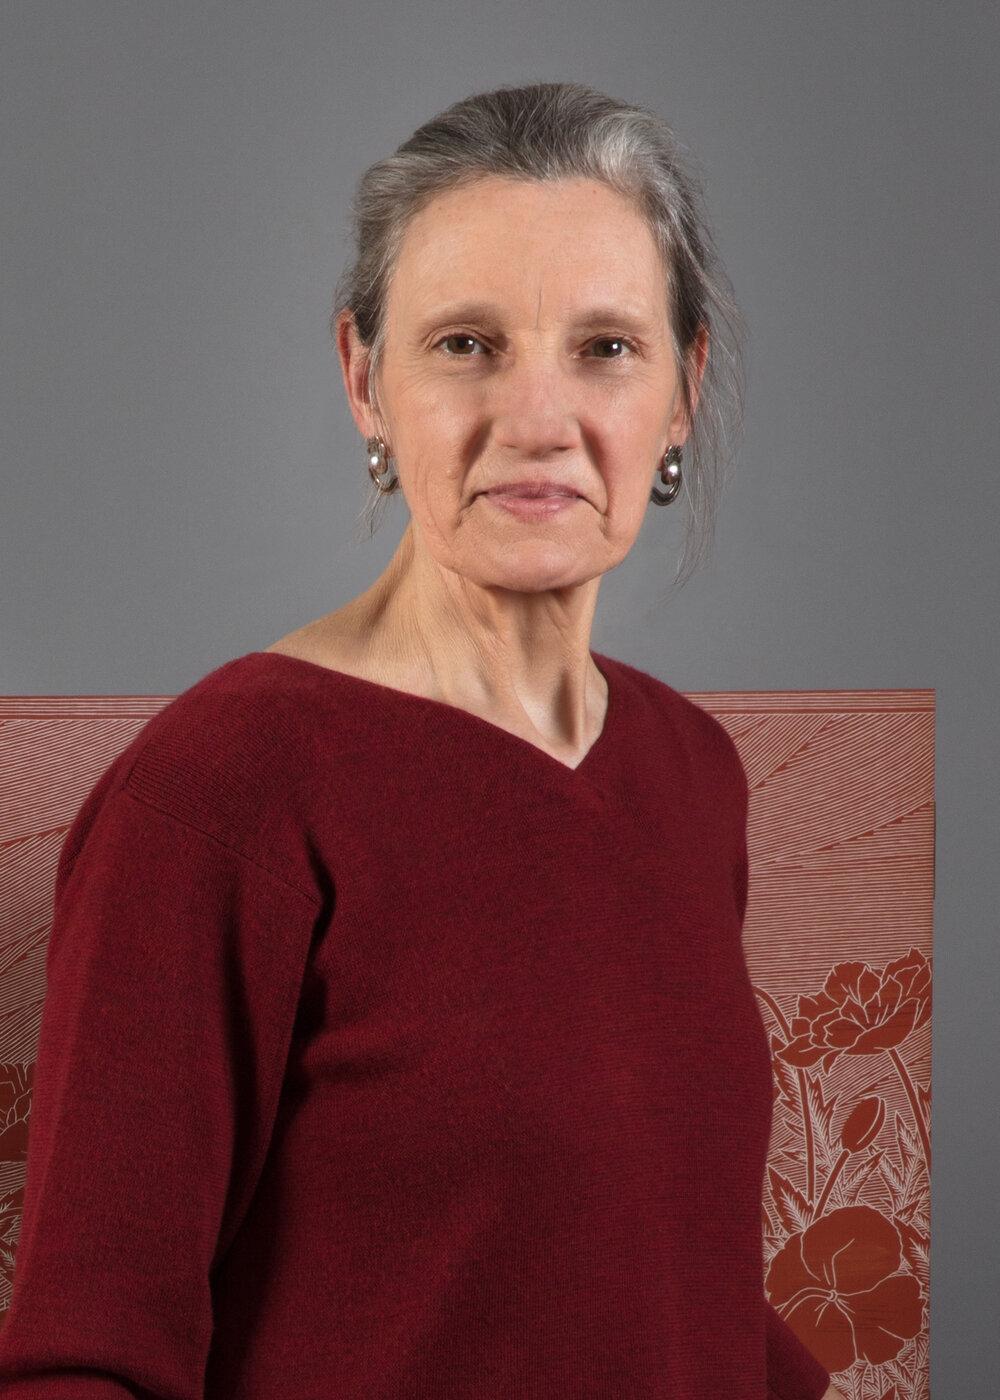 Kristina madsen 154